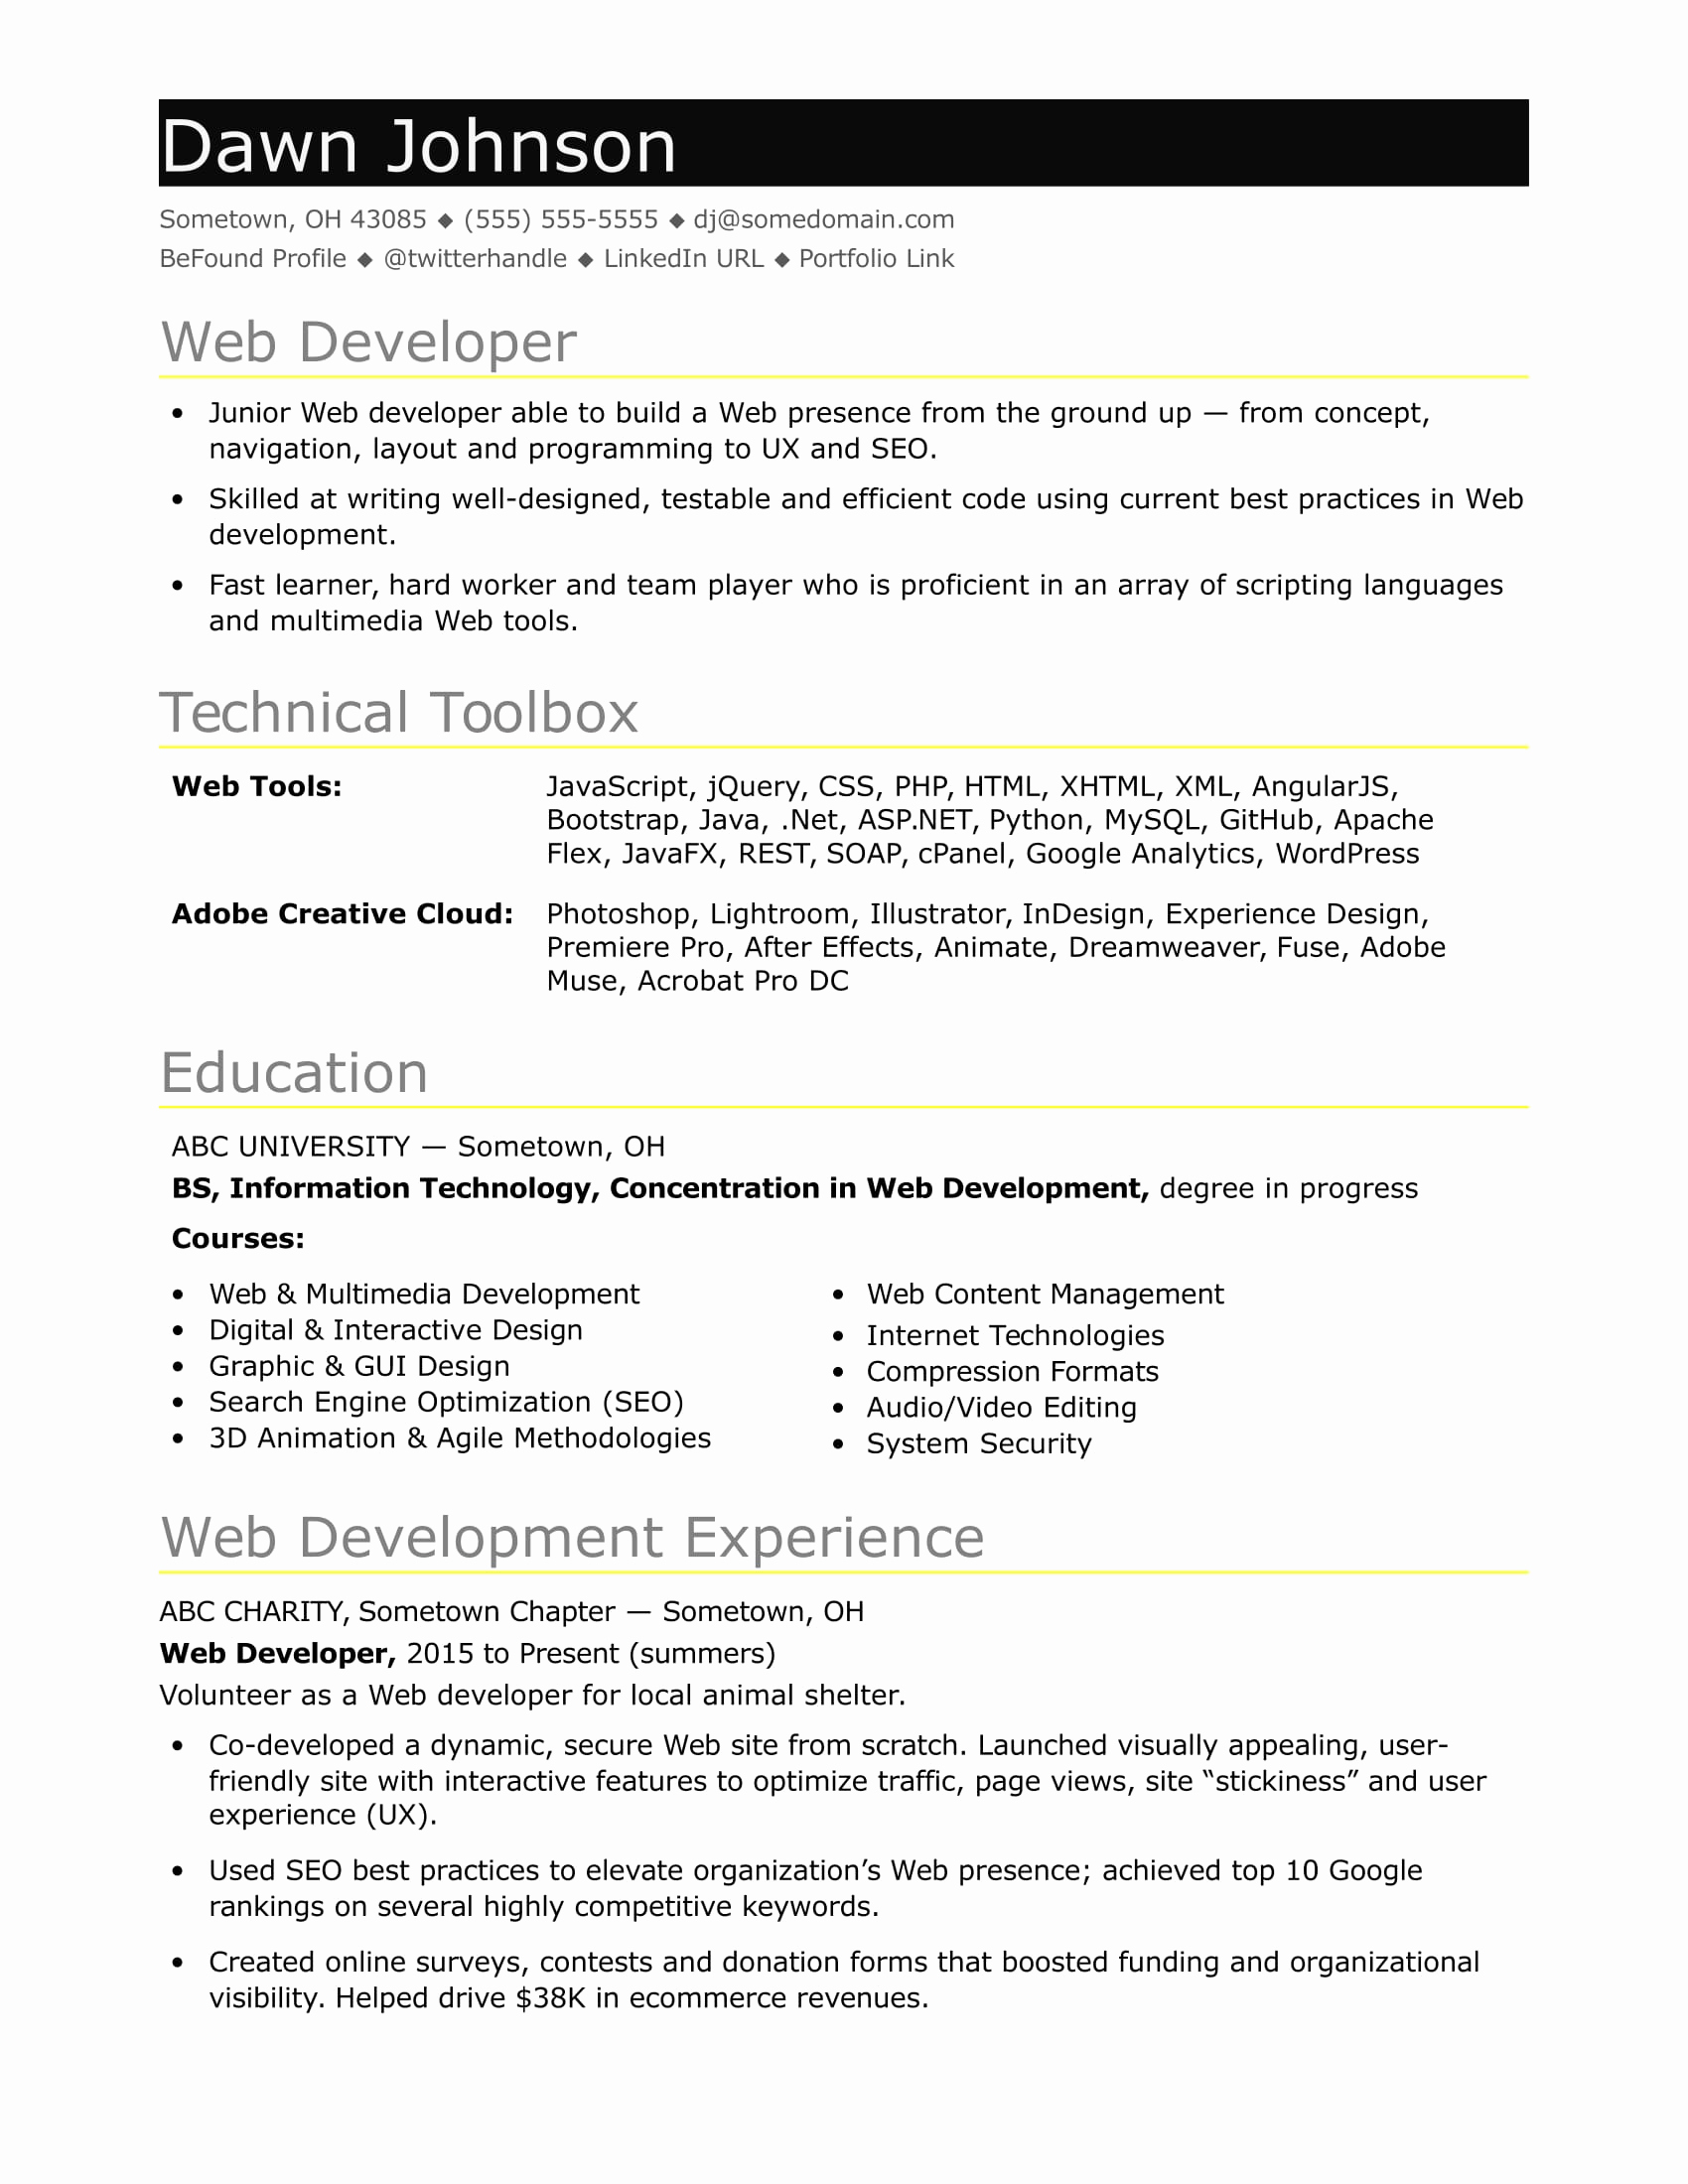 Web Developer Resume Template Awesome Sample Resume for An Entry Level It Developer